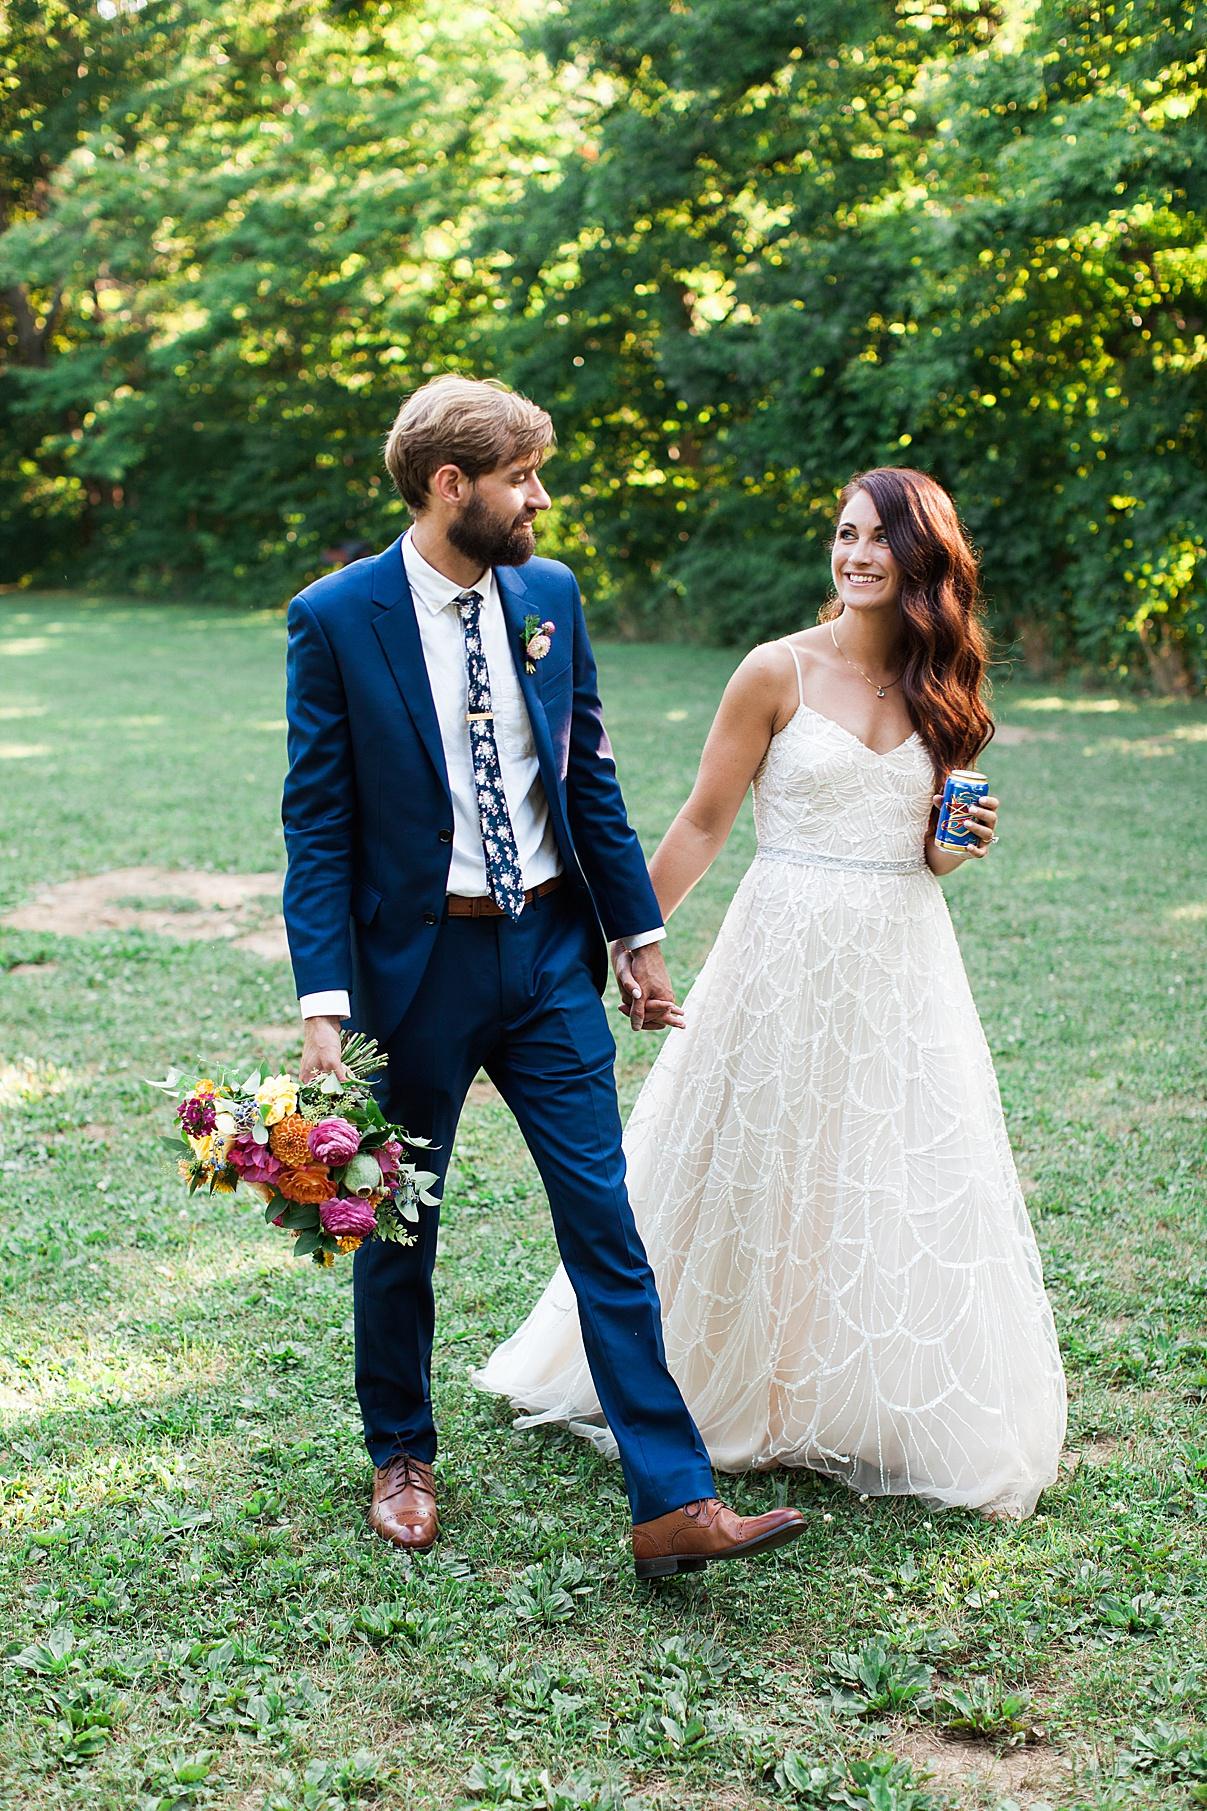 Bride and groom walking to wedding reception| Balls Falls, Ontario Wedding| Ontario Wedding Photographer| Toronto Wedding Photographer| 3Photography| 3photography.ca